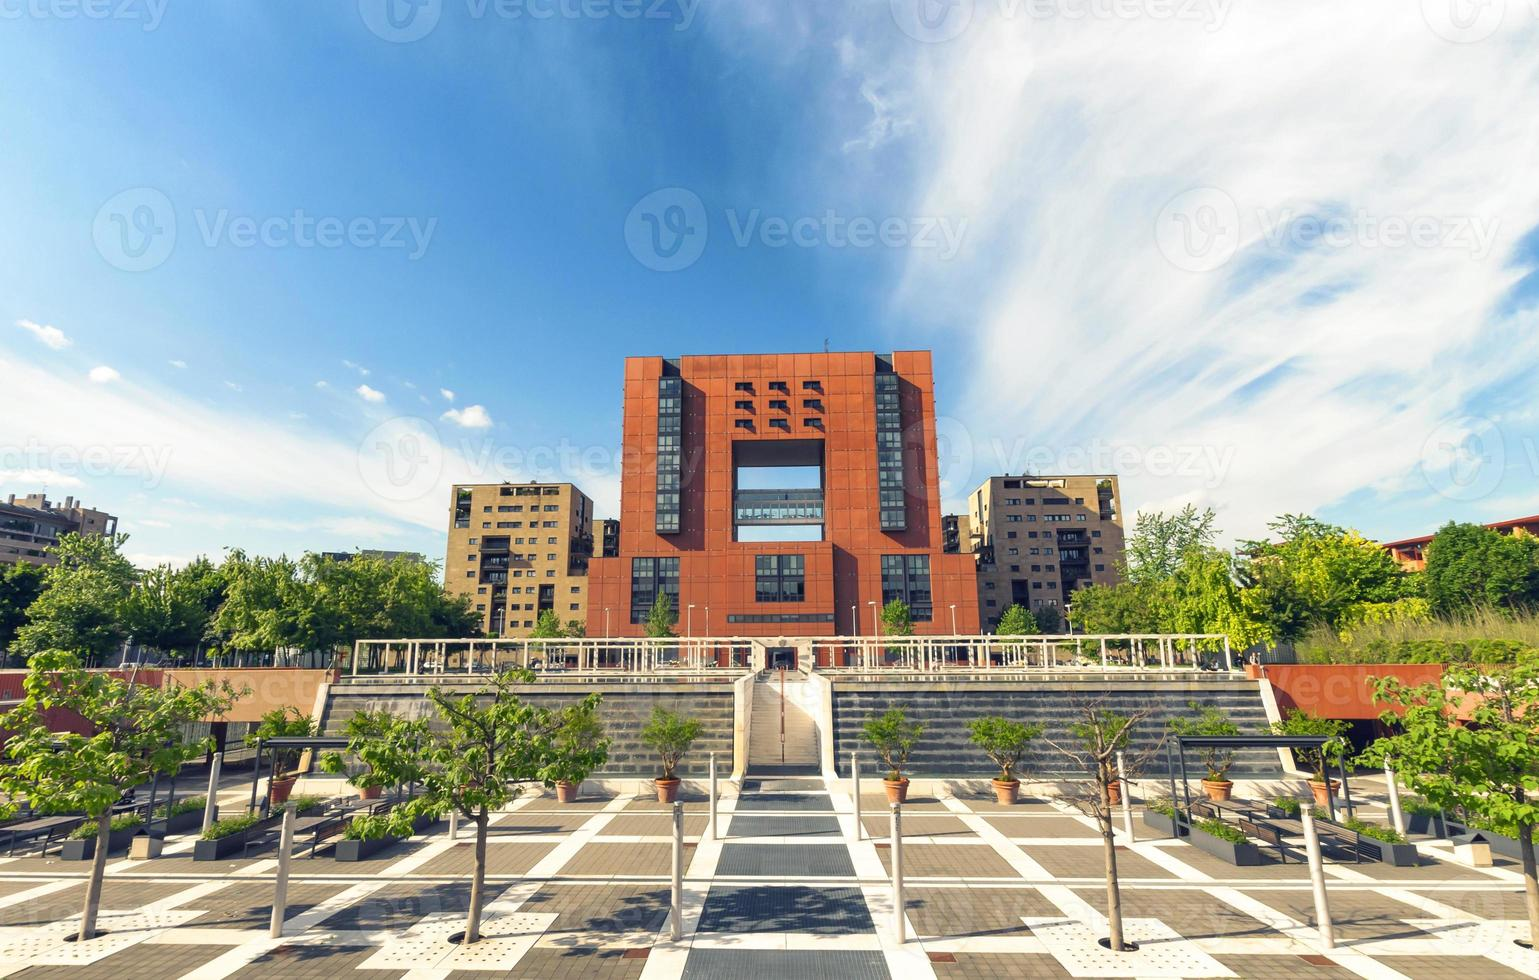 Université bicocca, milan italie photo